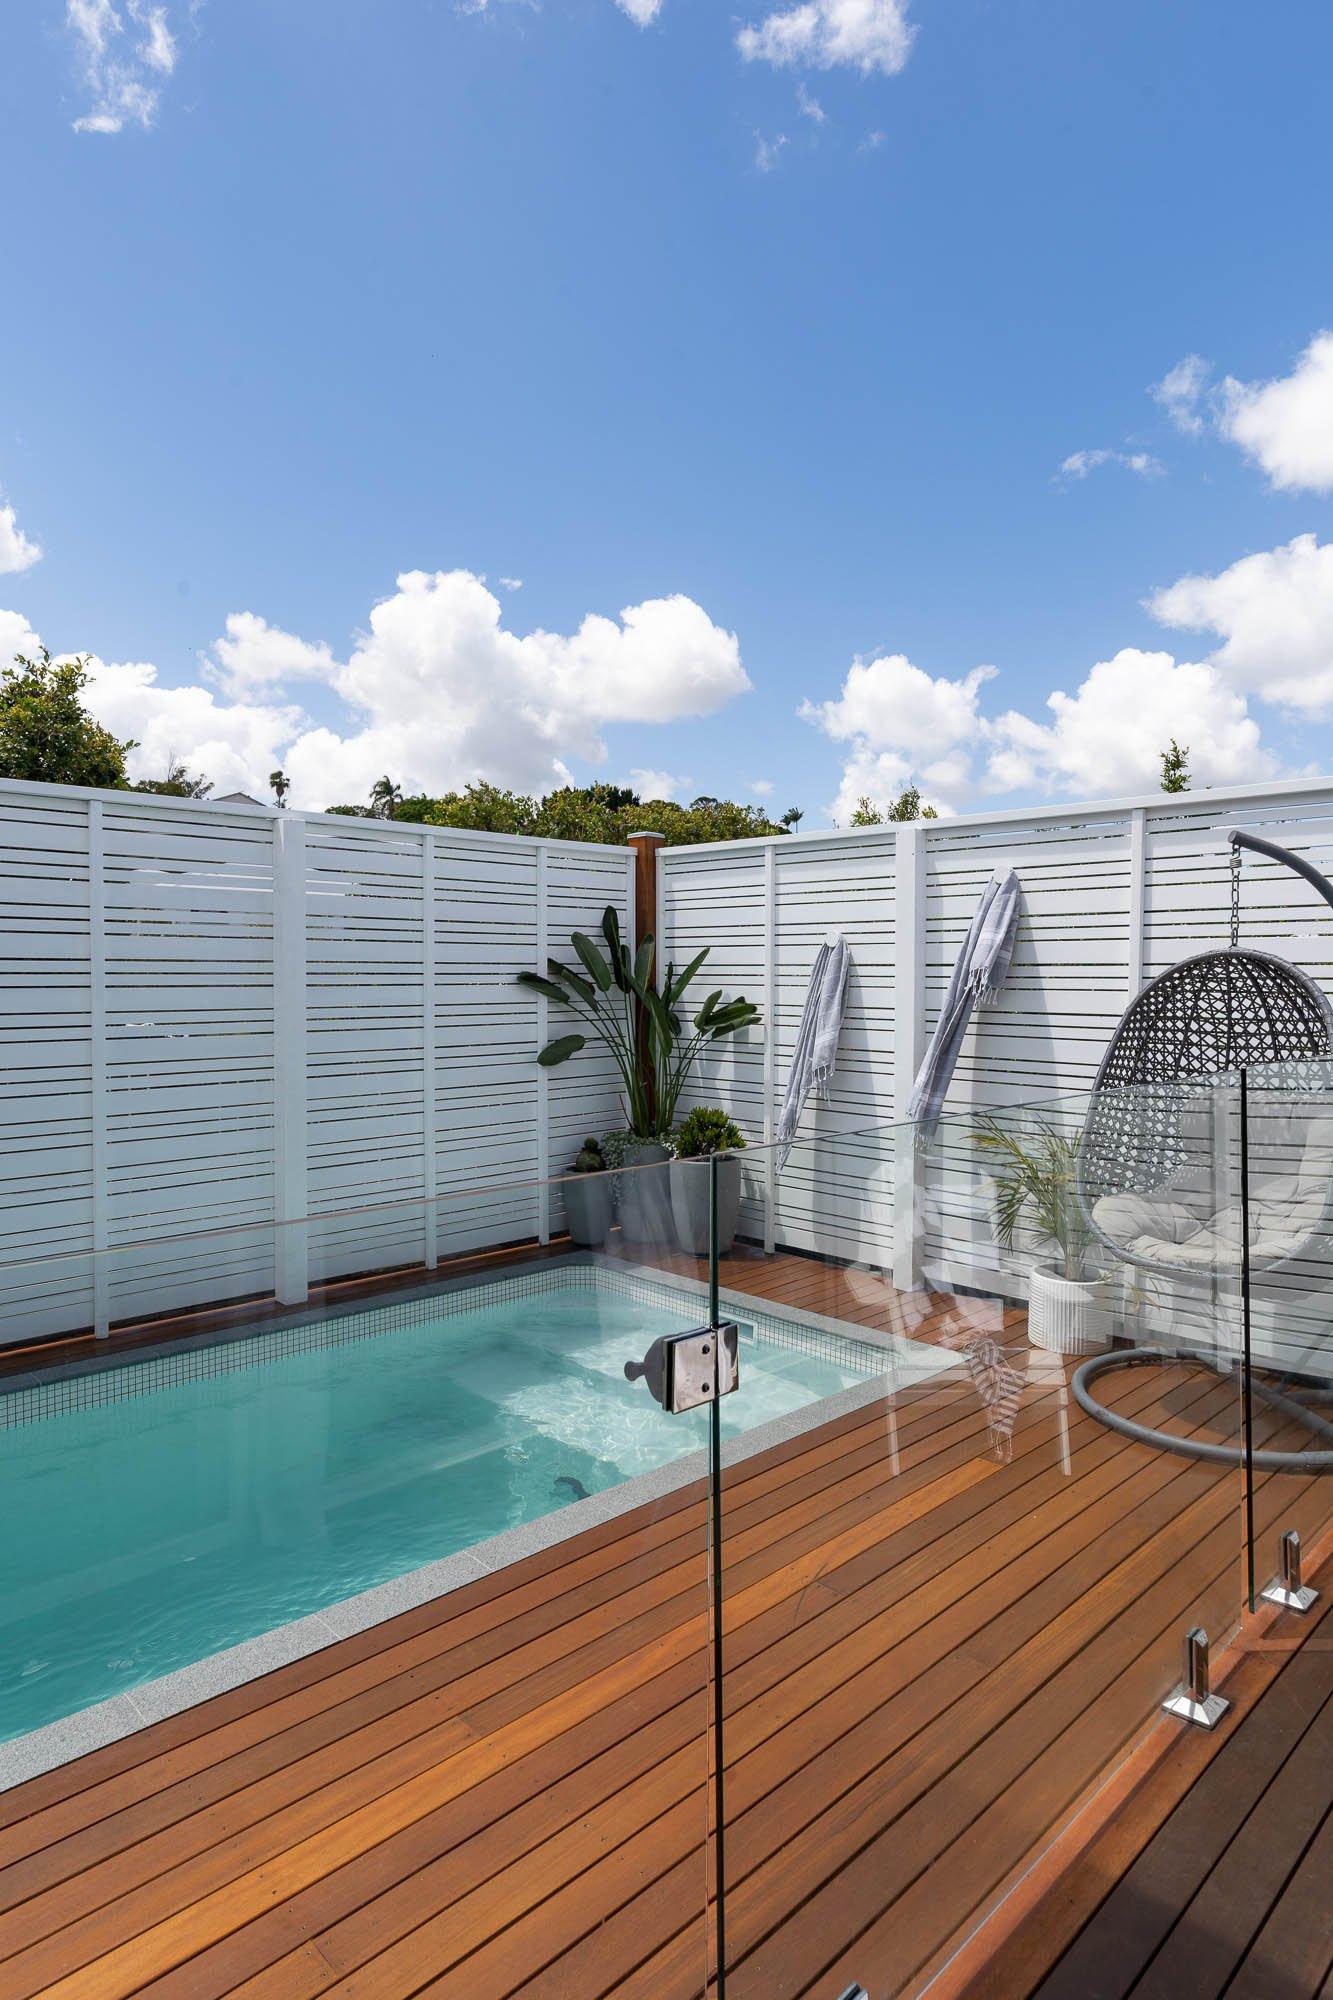 Plungie Studio 3.6m x 2.2m concrete plunge pool in Kona Coast